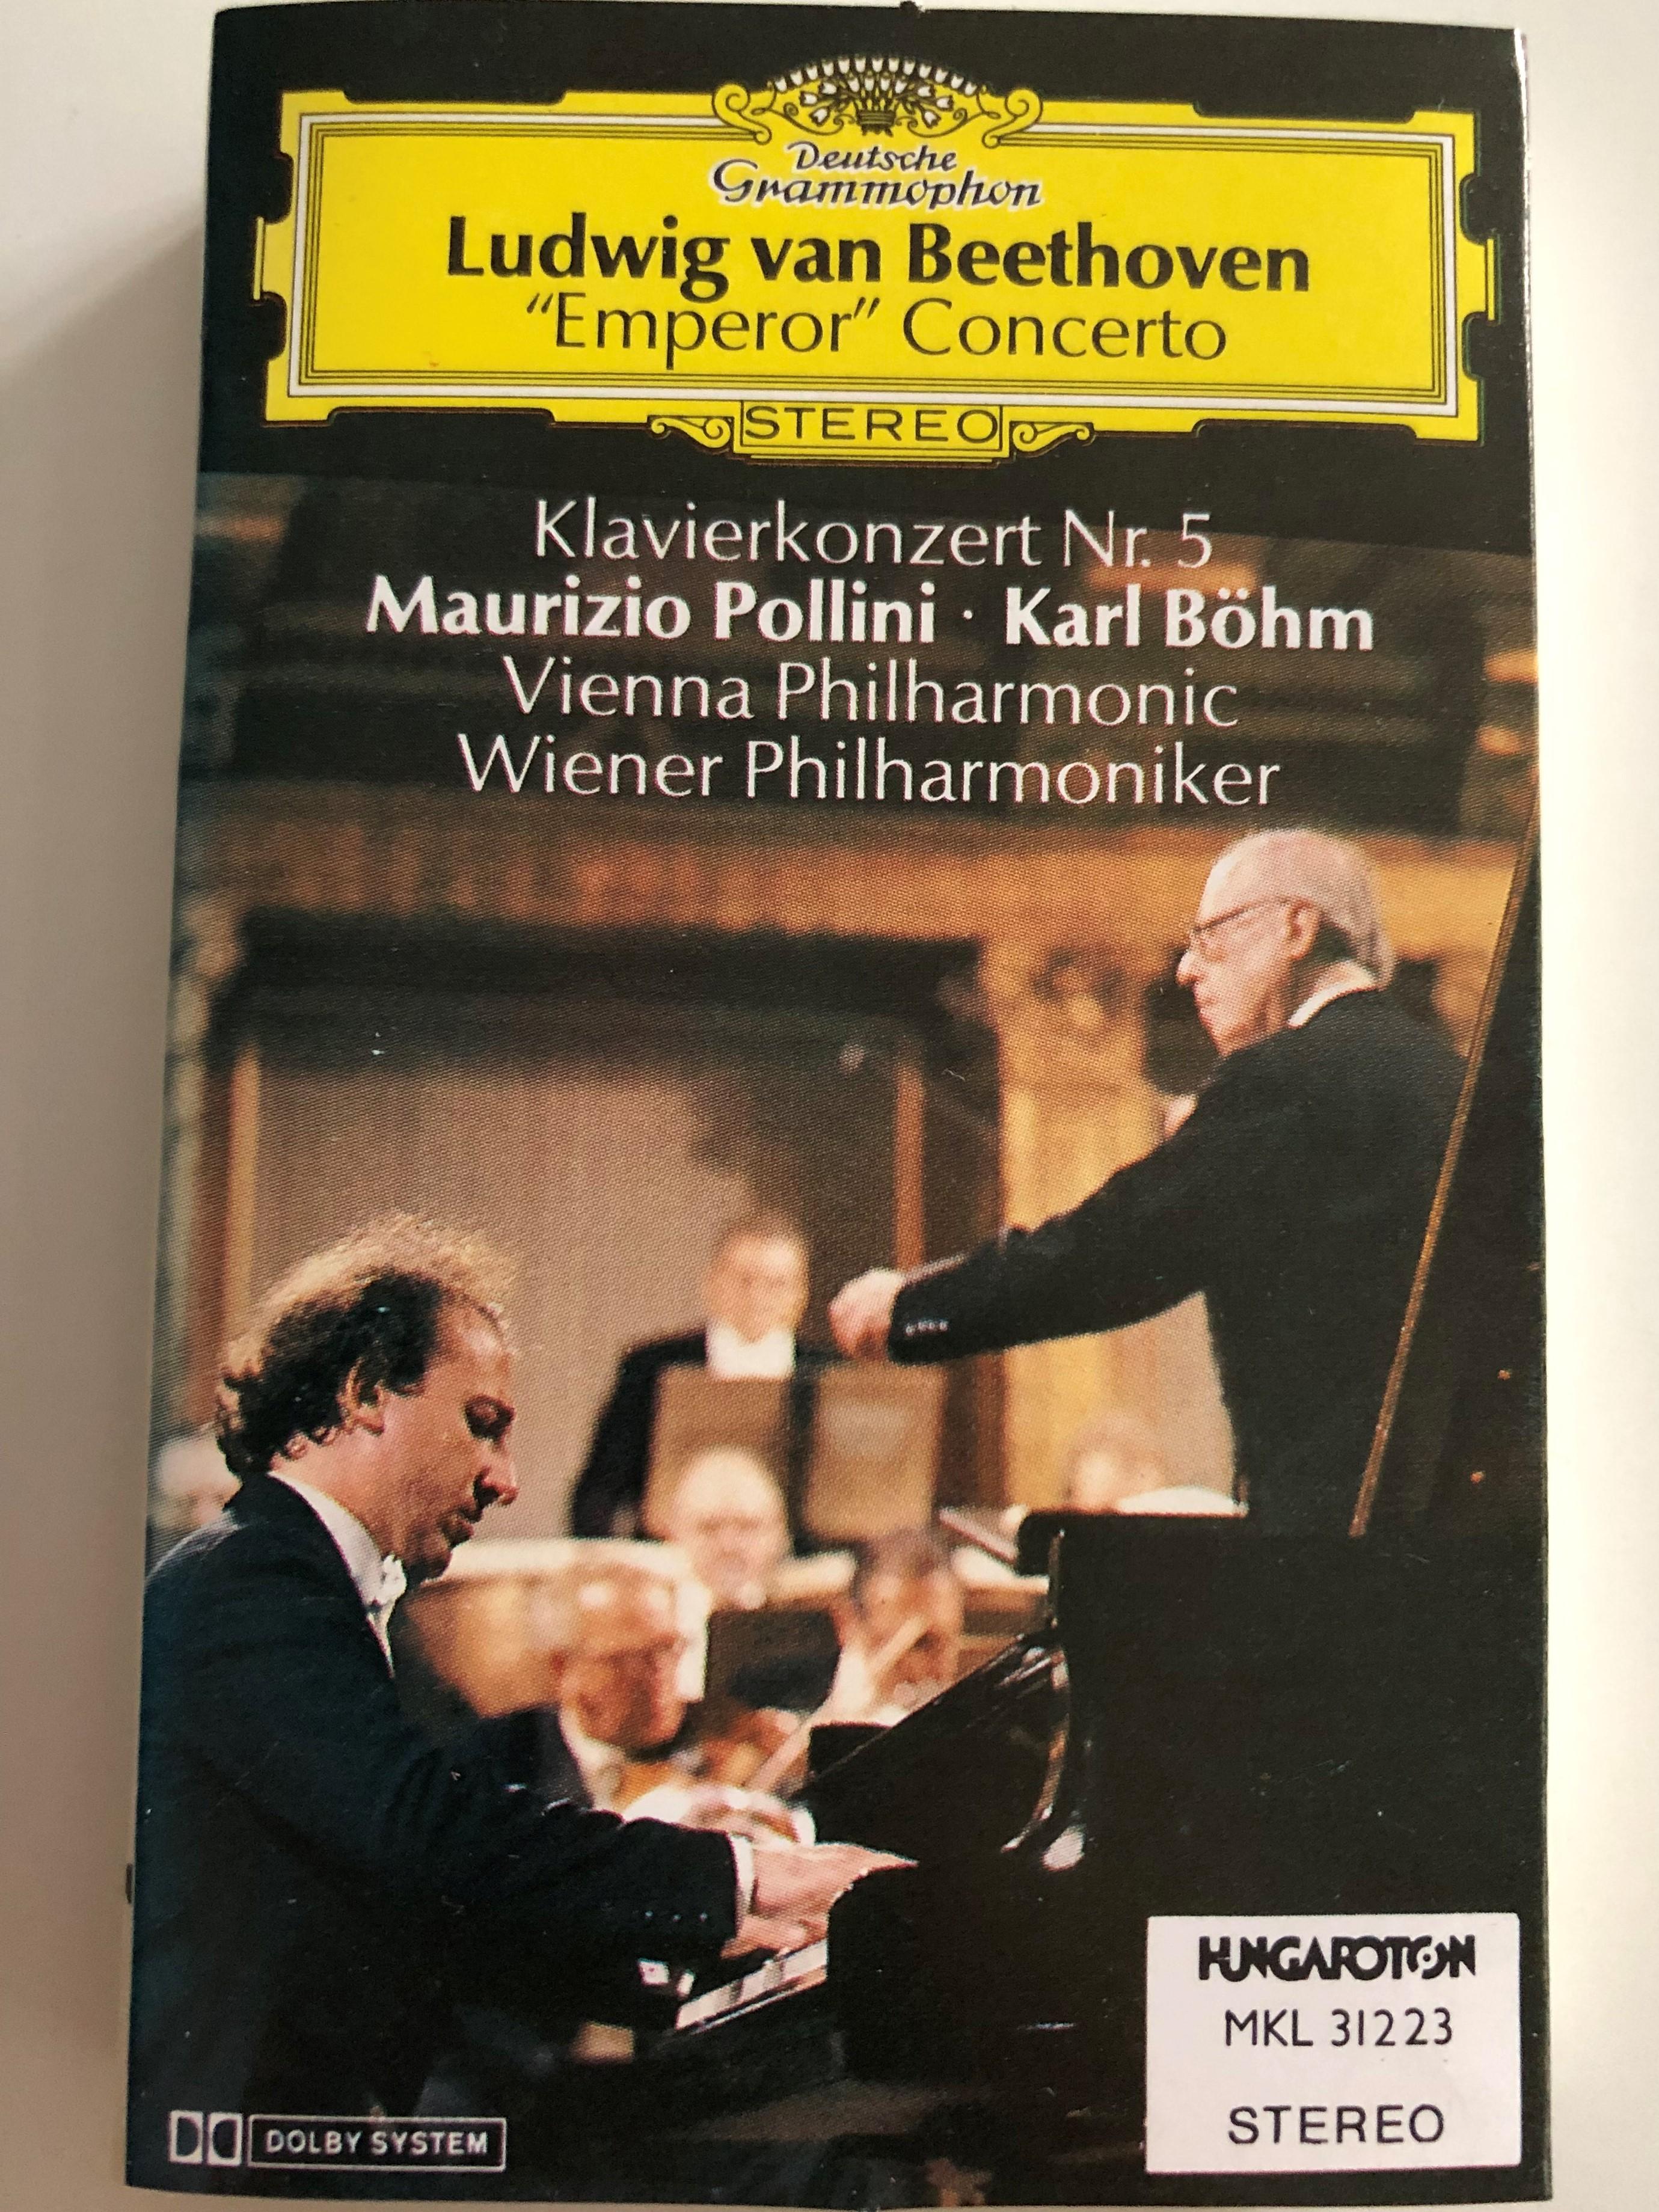 ludwig-van-beethoven-emperor-concerto-klavierkonzert-nr.5-maurizio-pollini-karl-b-hm-vienna-philharmonic-wiener-philharmoniker-deutsche-grammophon-cassette-stereo-mkl-31223-1-.jpg